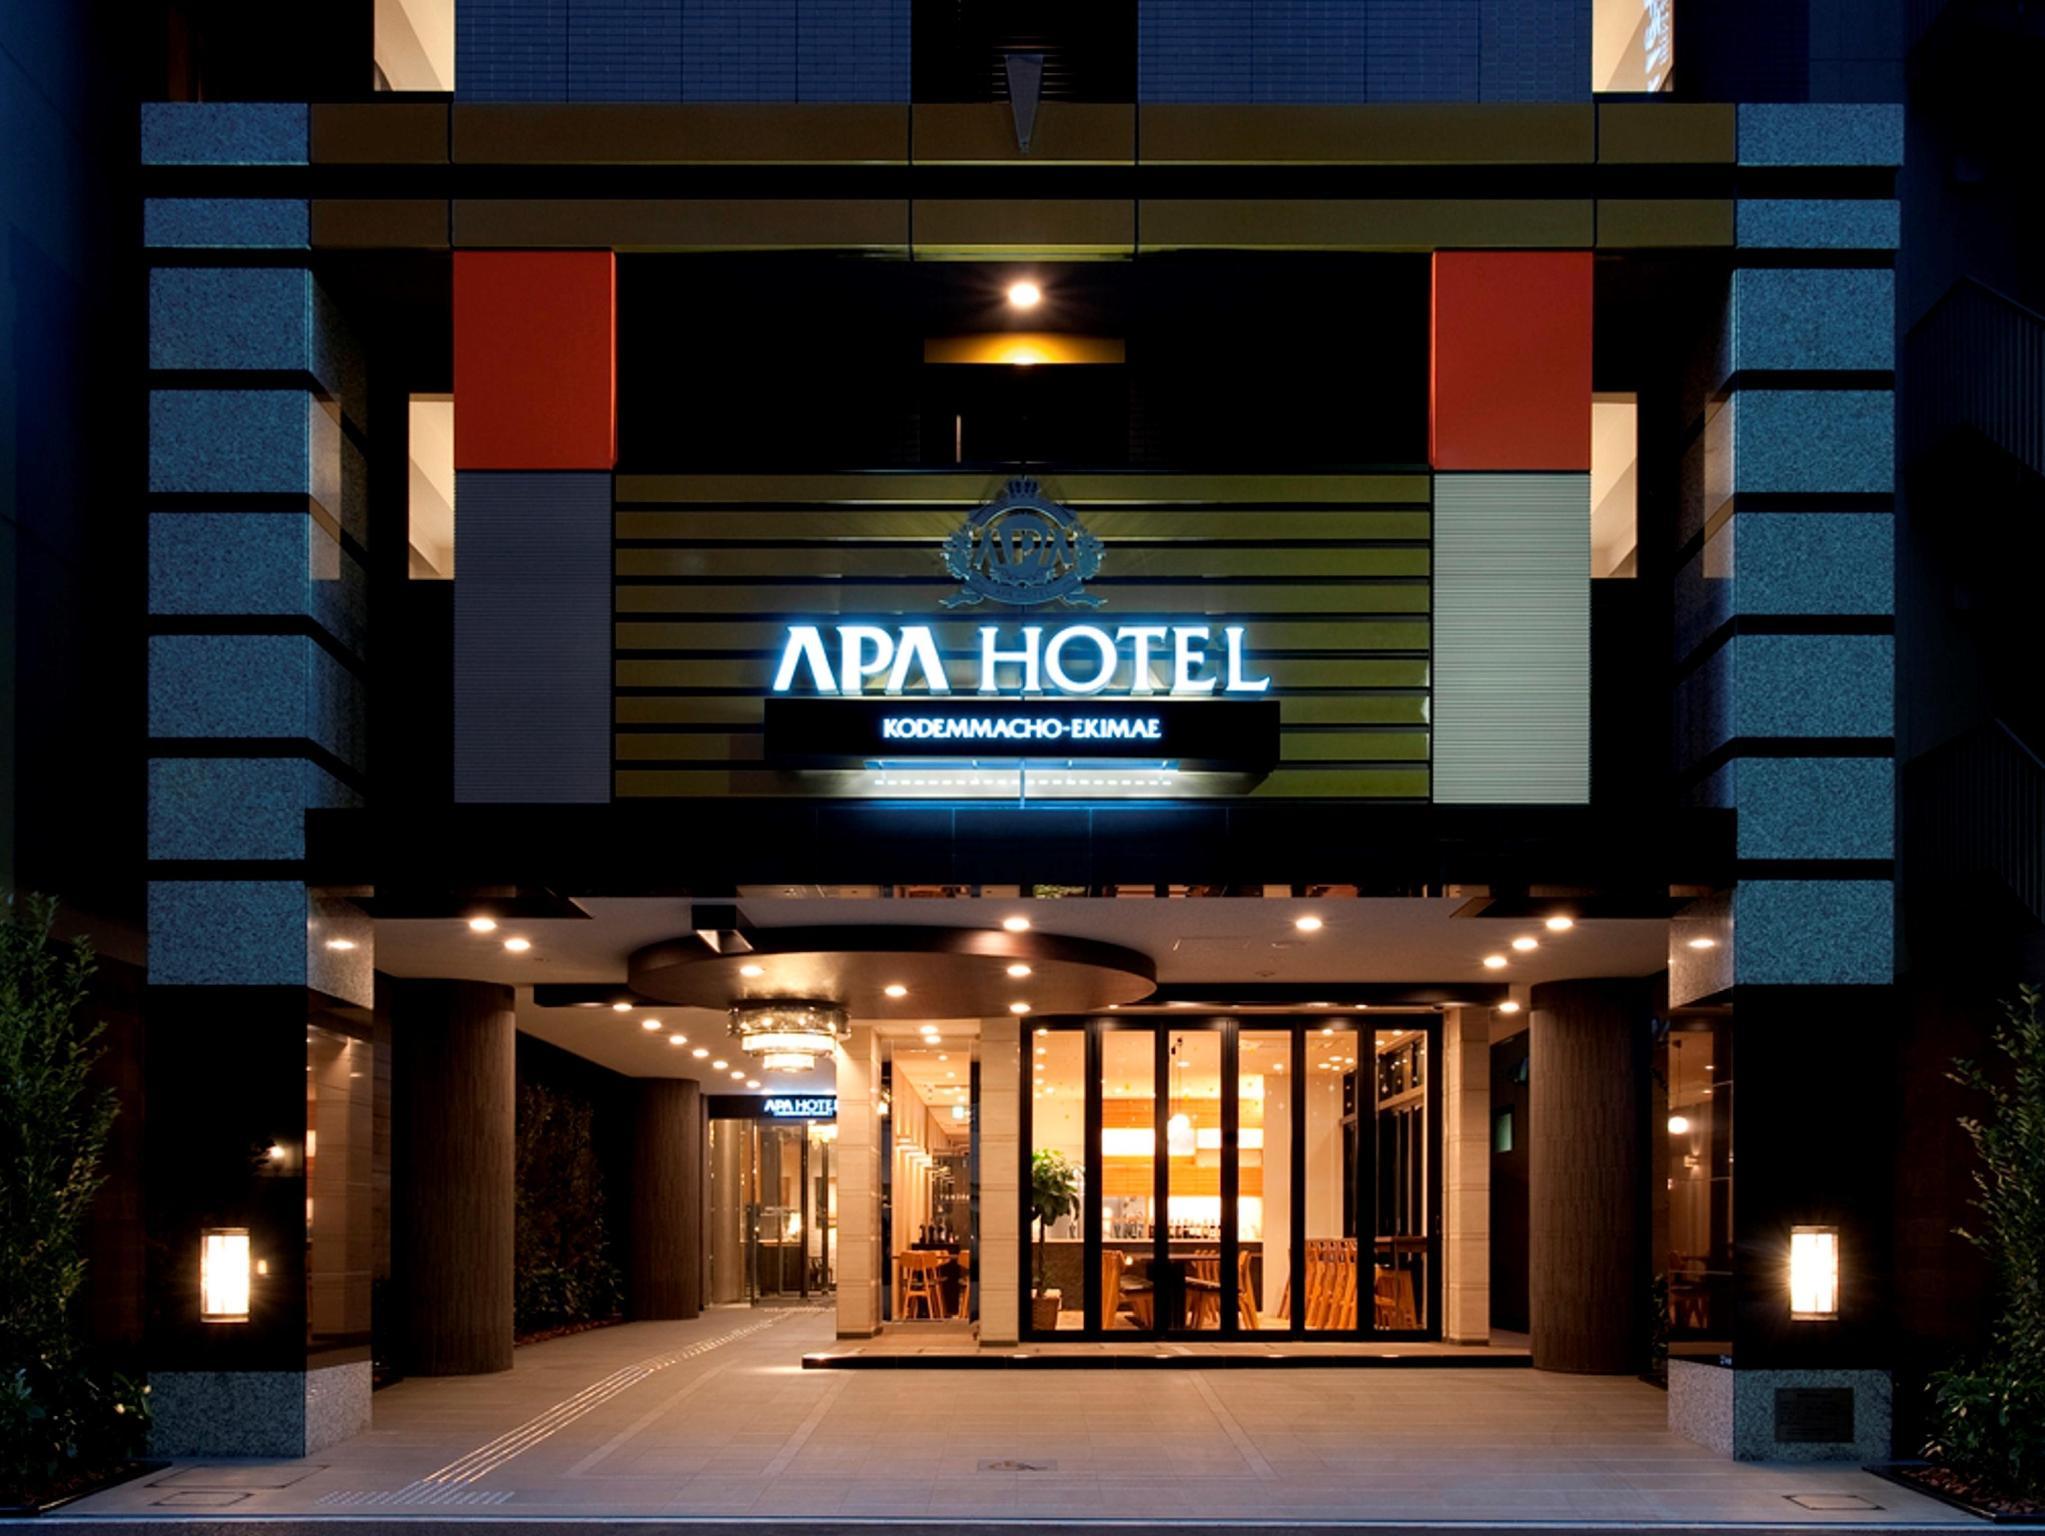 APA Hotel Kodemmacho-Ekimae, Chiyoda